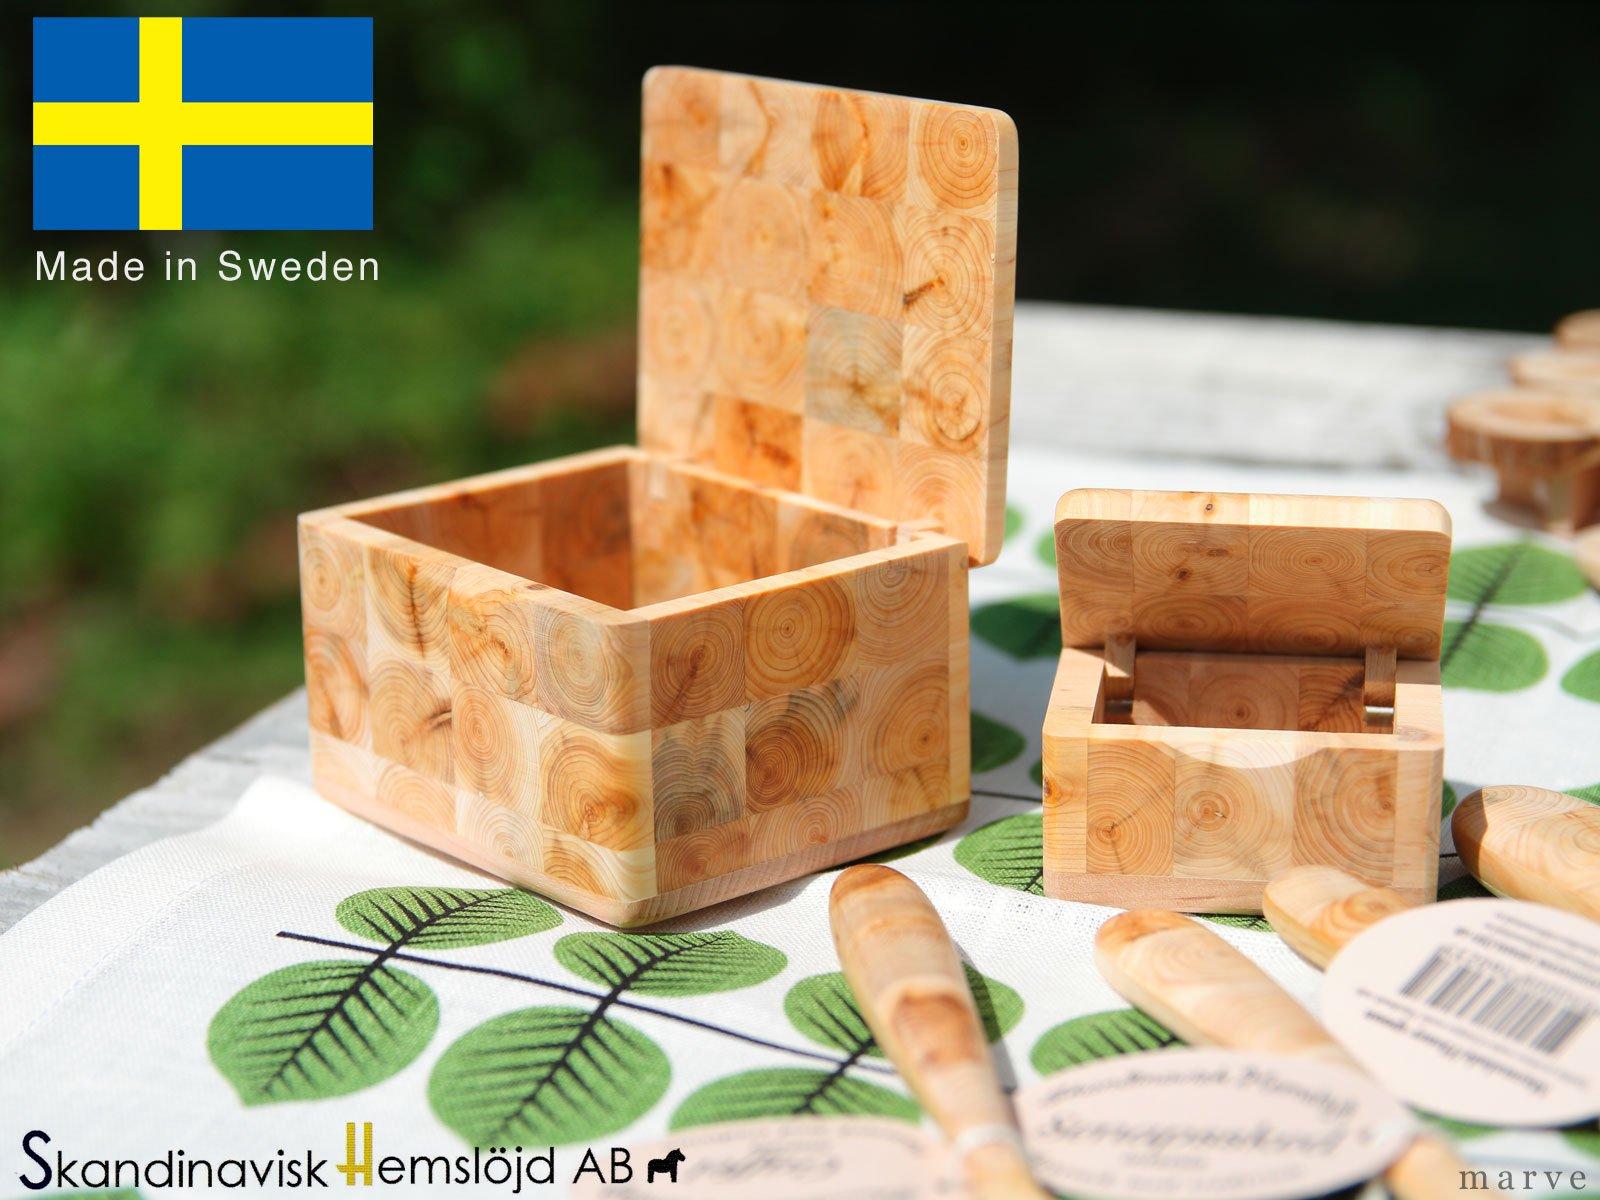 Skandinavisk Hemslojd AB ボックスS<img class='new_mark_img2' src='https://img.shop-pro.jp/img/new/icons1.gif' style='border:none;display:inline;margin:0px;padding:0px;width:auto;' />